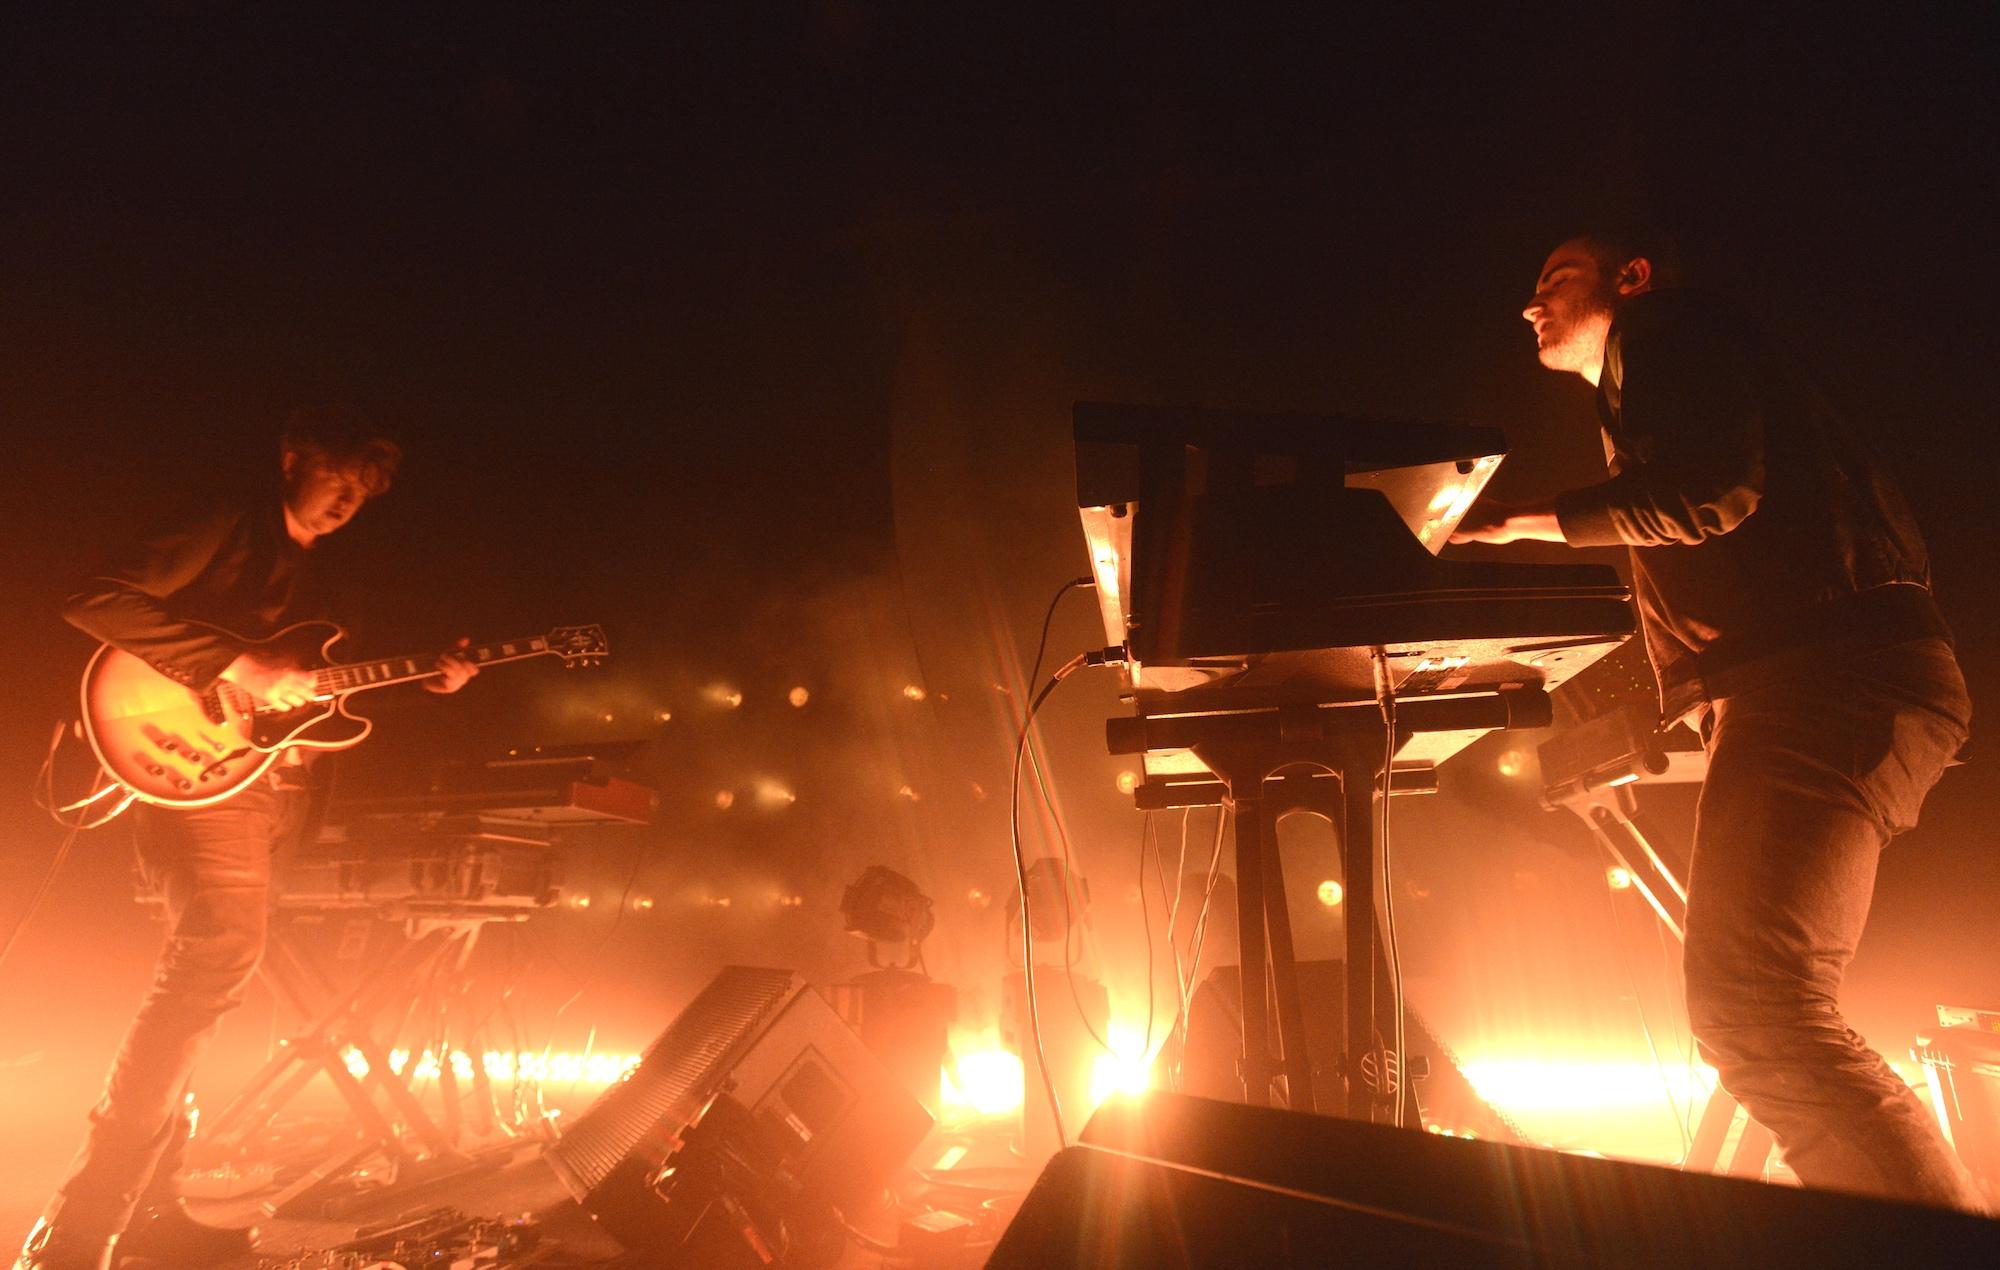 Darkside perform live in 2014